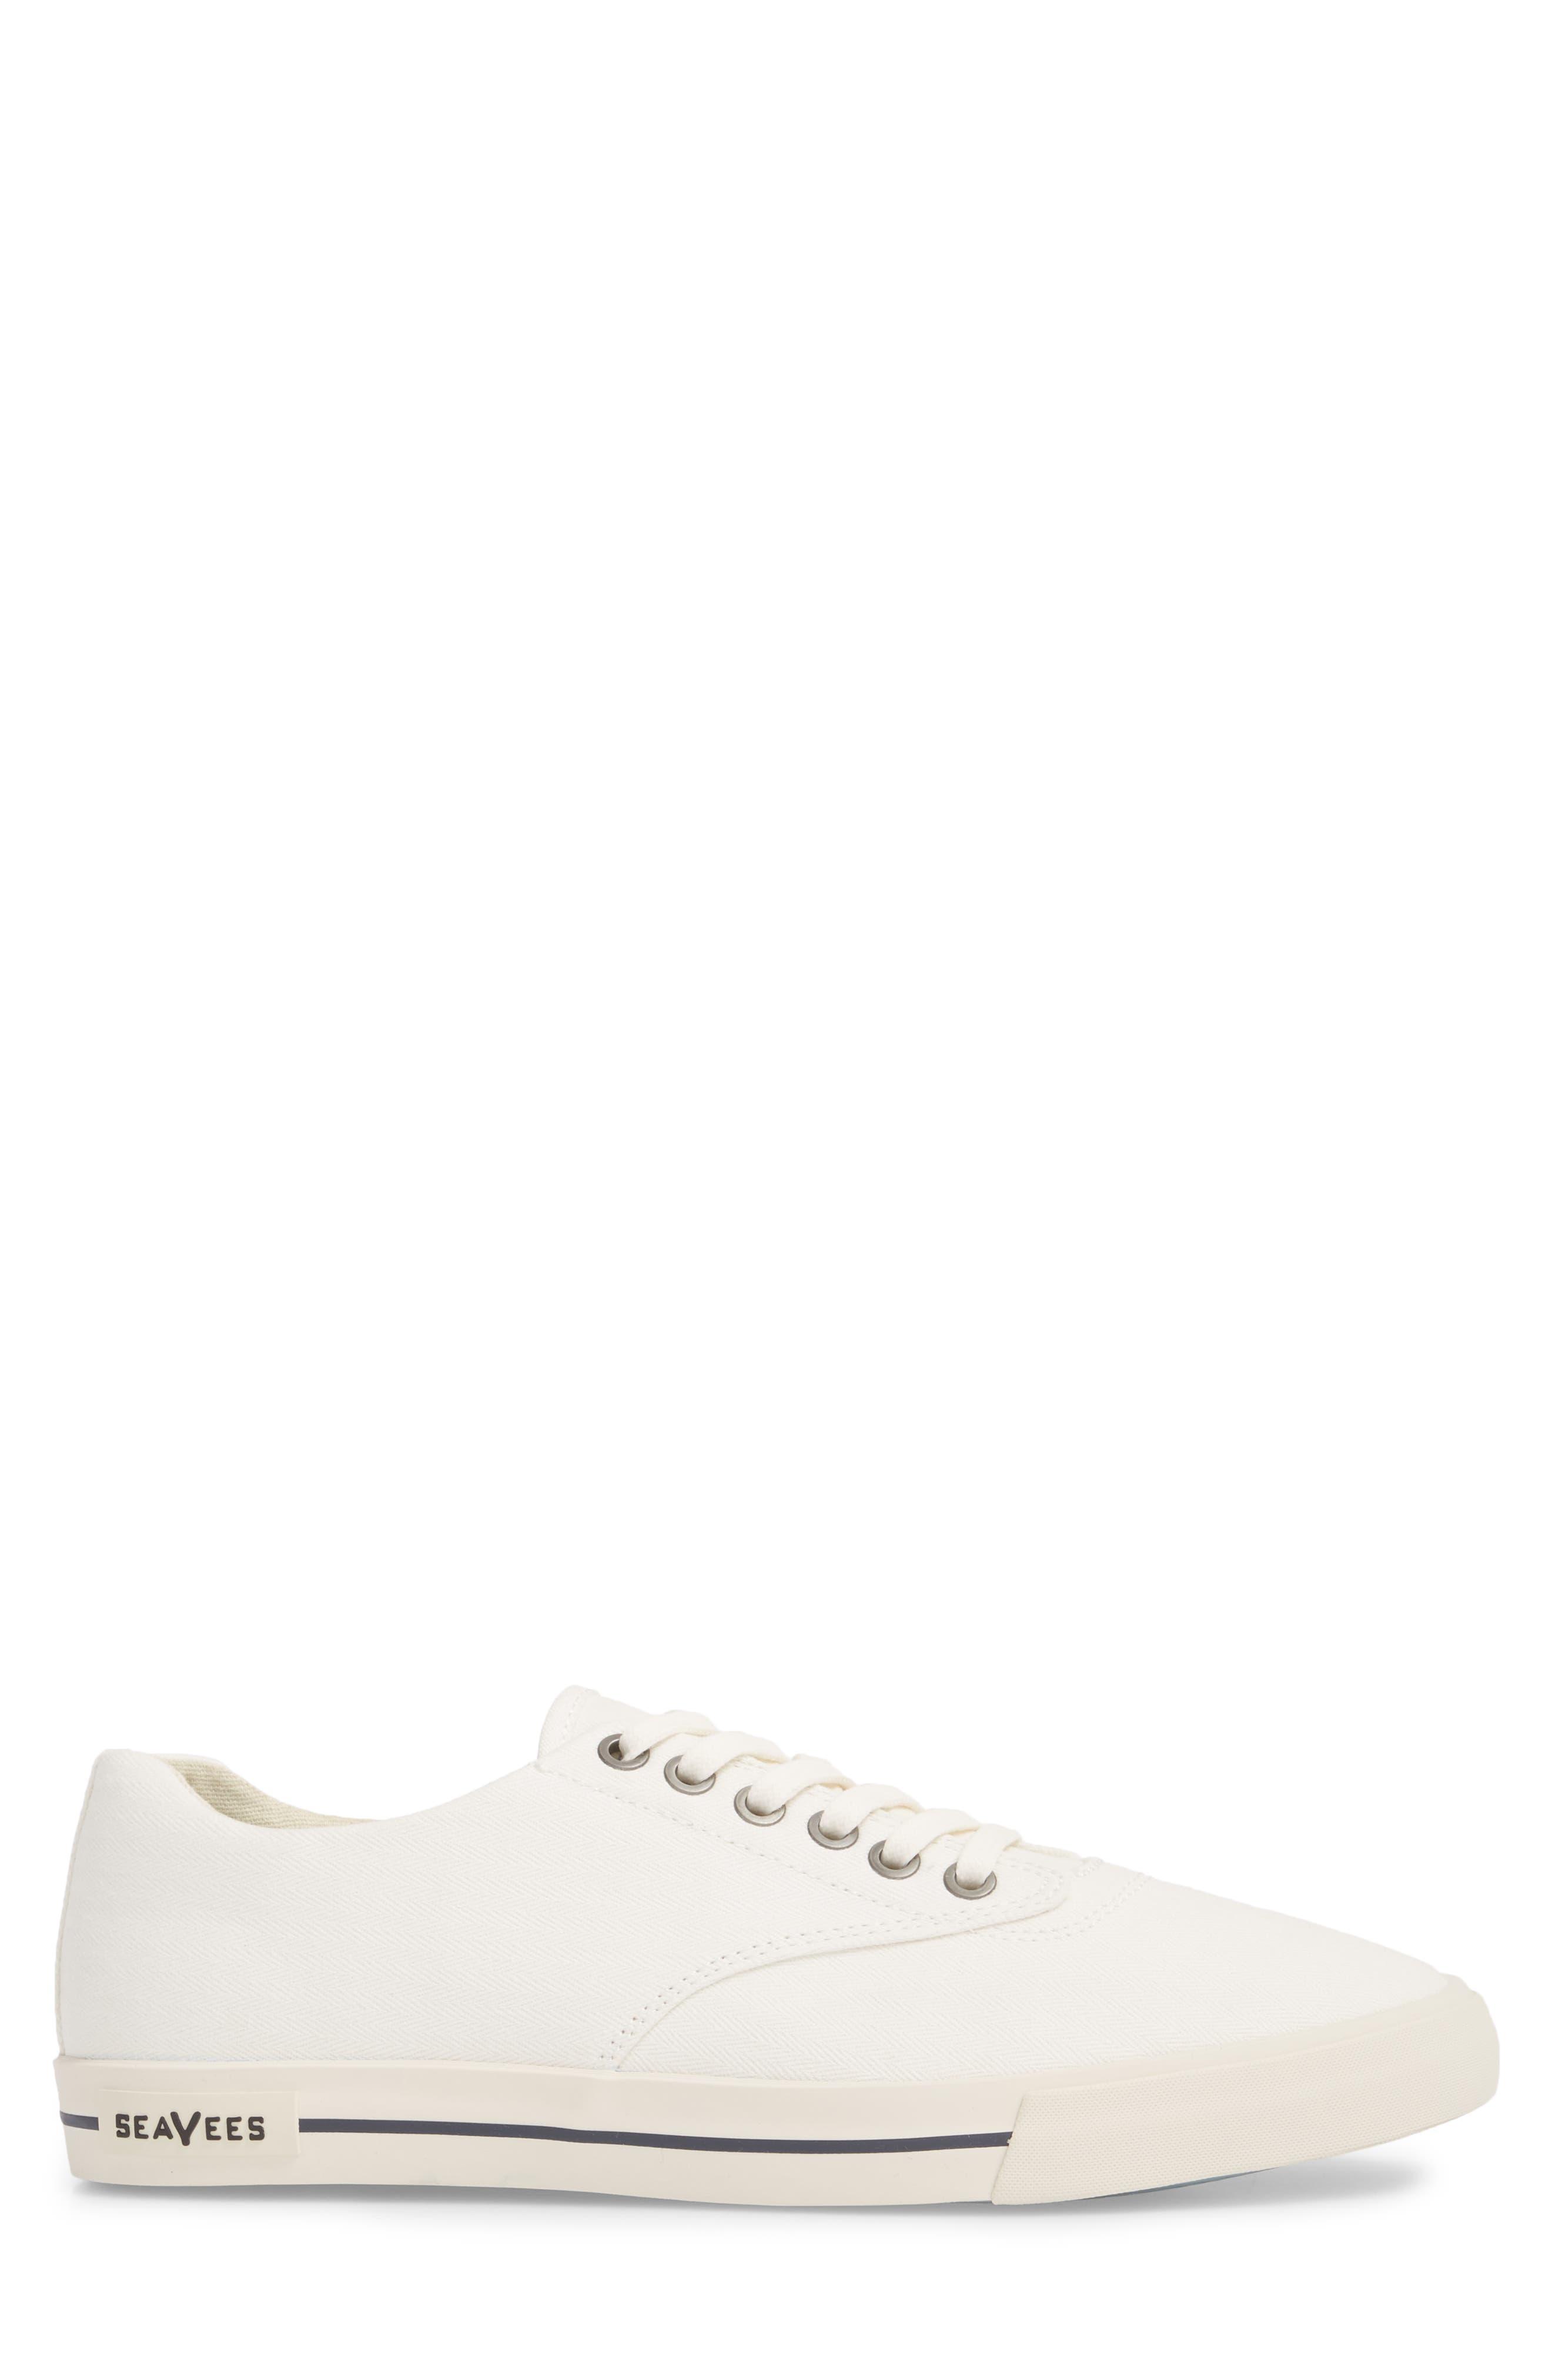 SEAVEES,                             Hermosa Plimsoll Sneaker,                             Alternate thumbnail 3, color,                             125